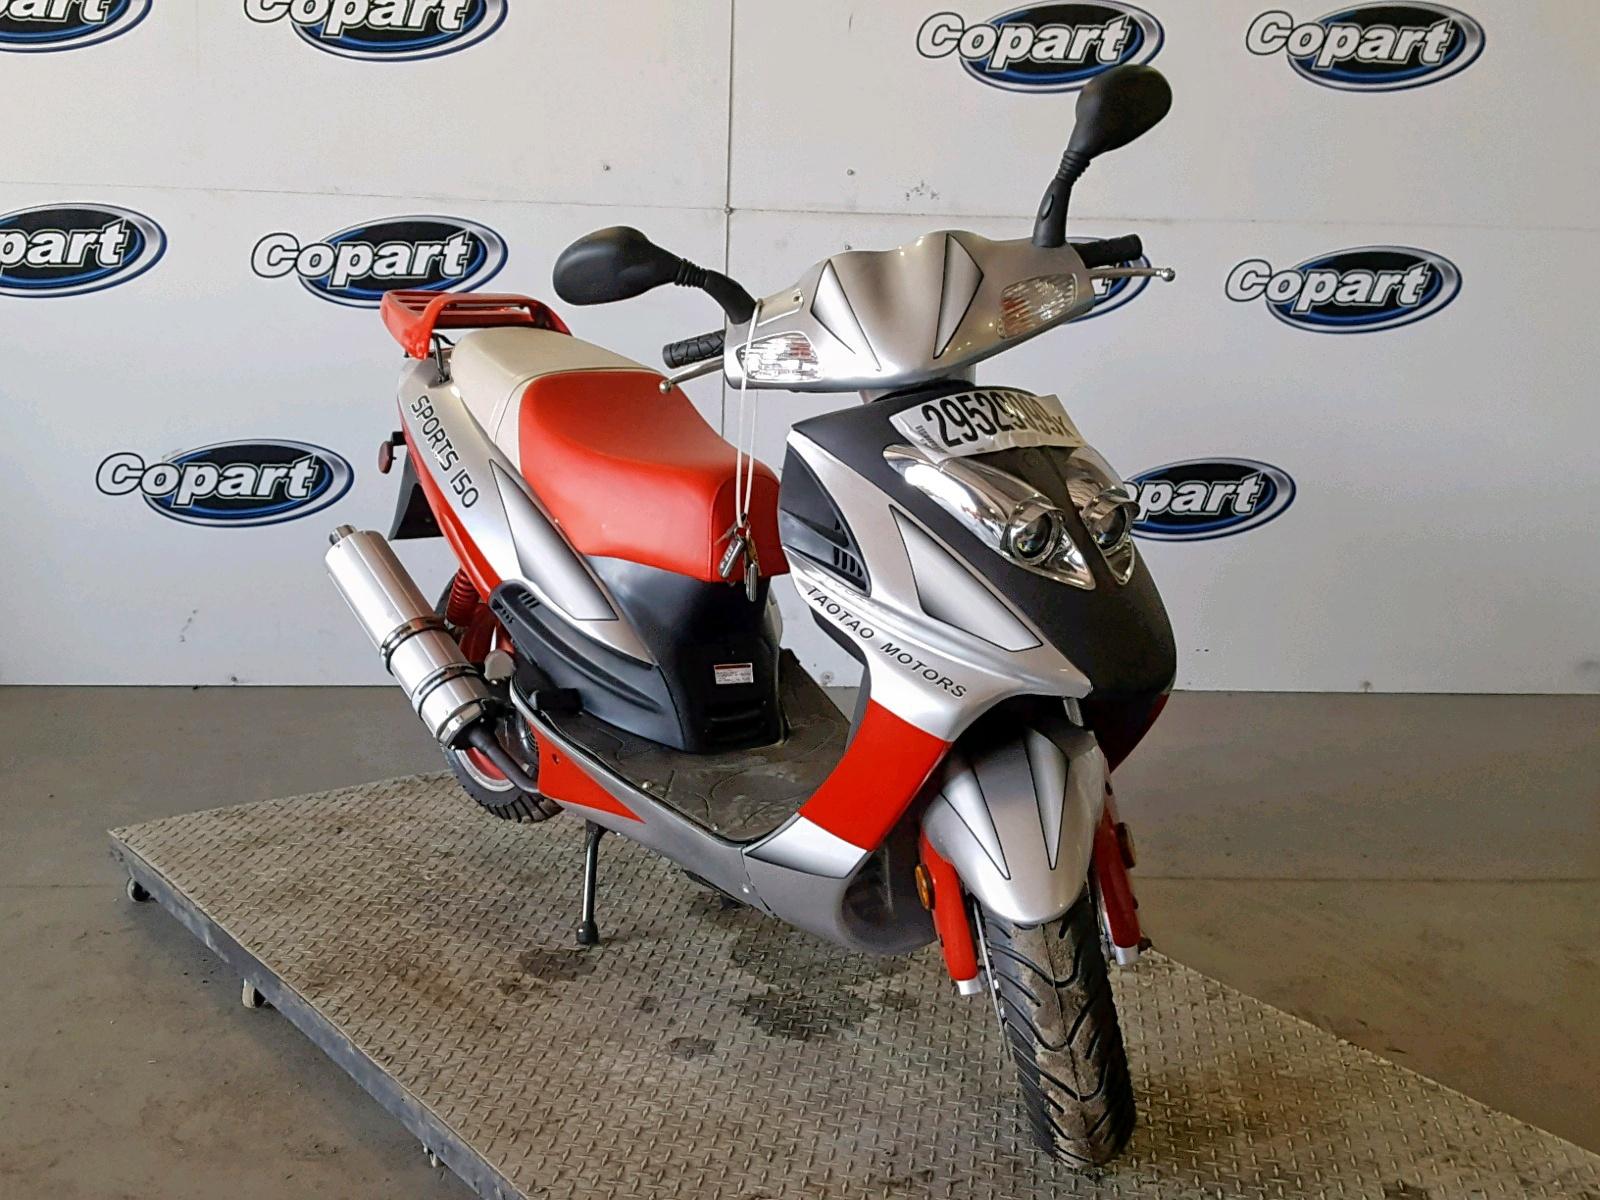 2019 Taotao Motorcycle